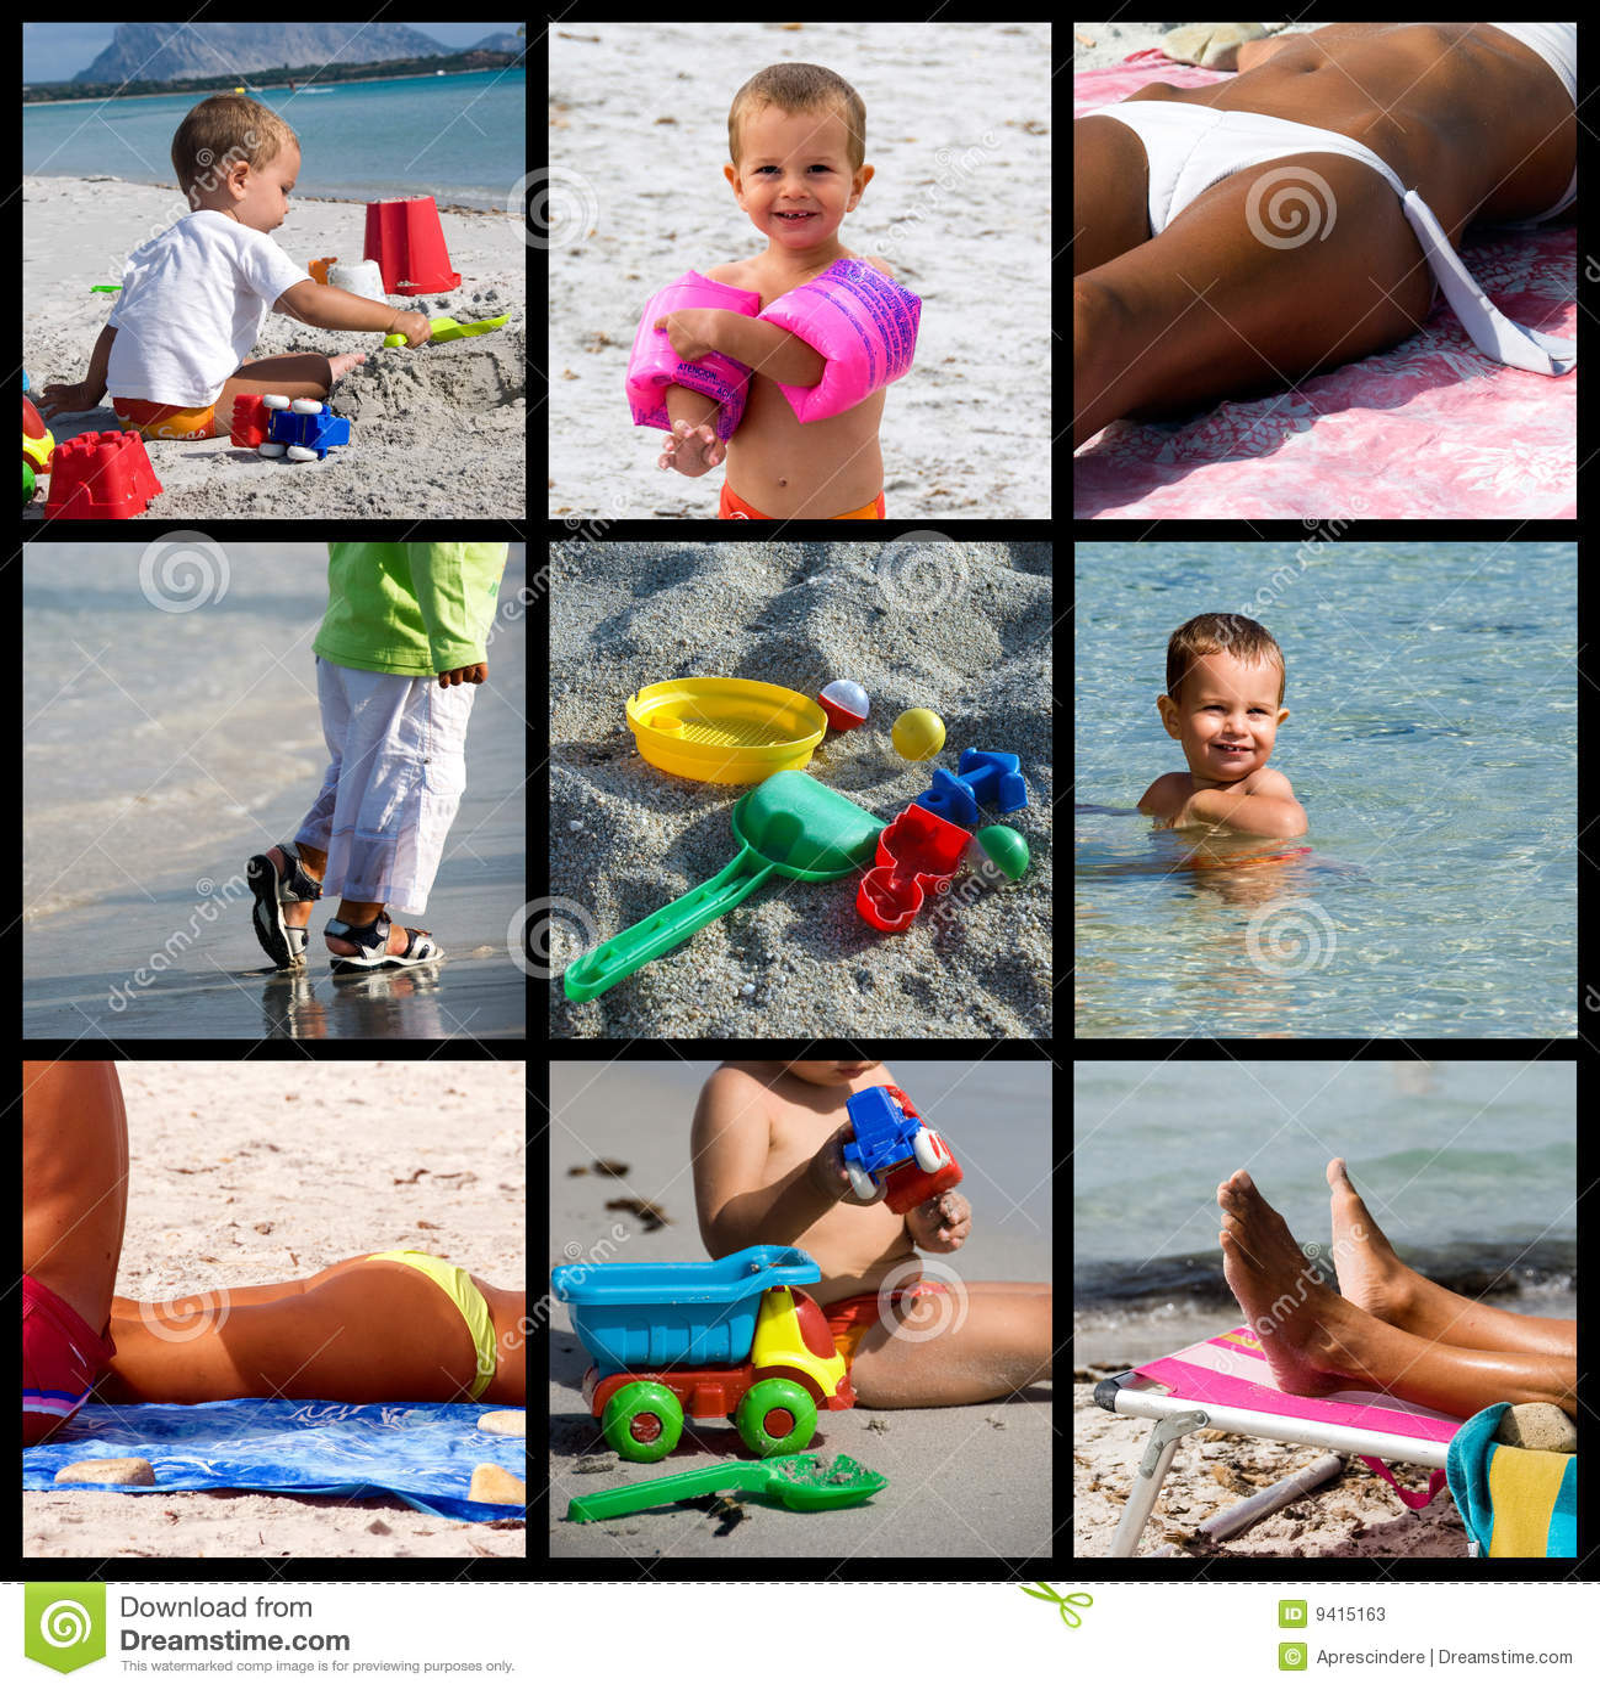 Summer beach life collage